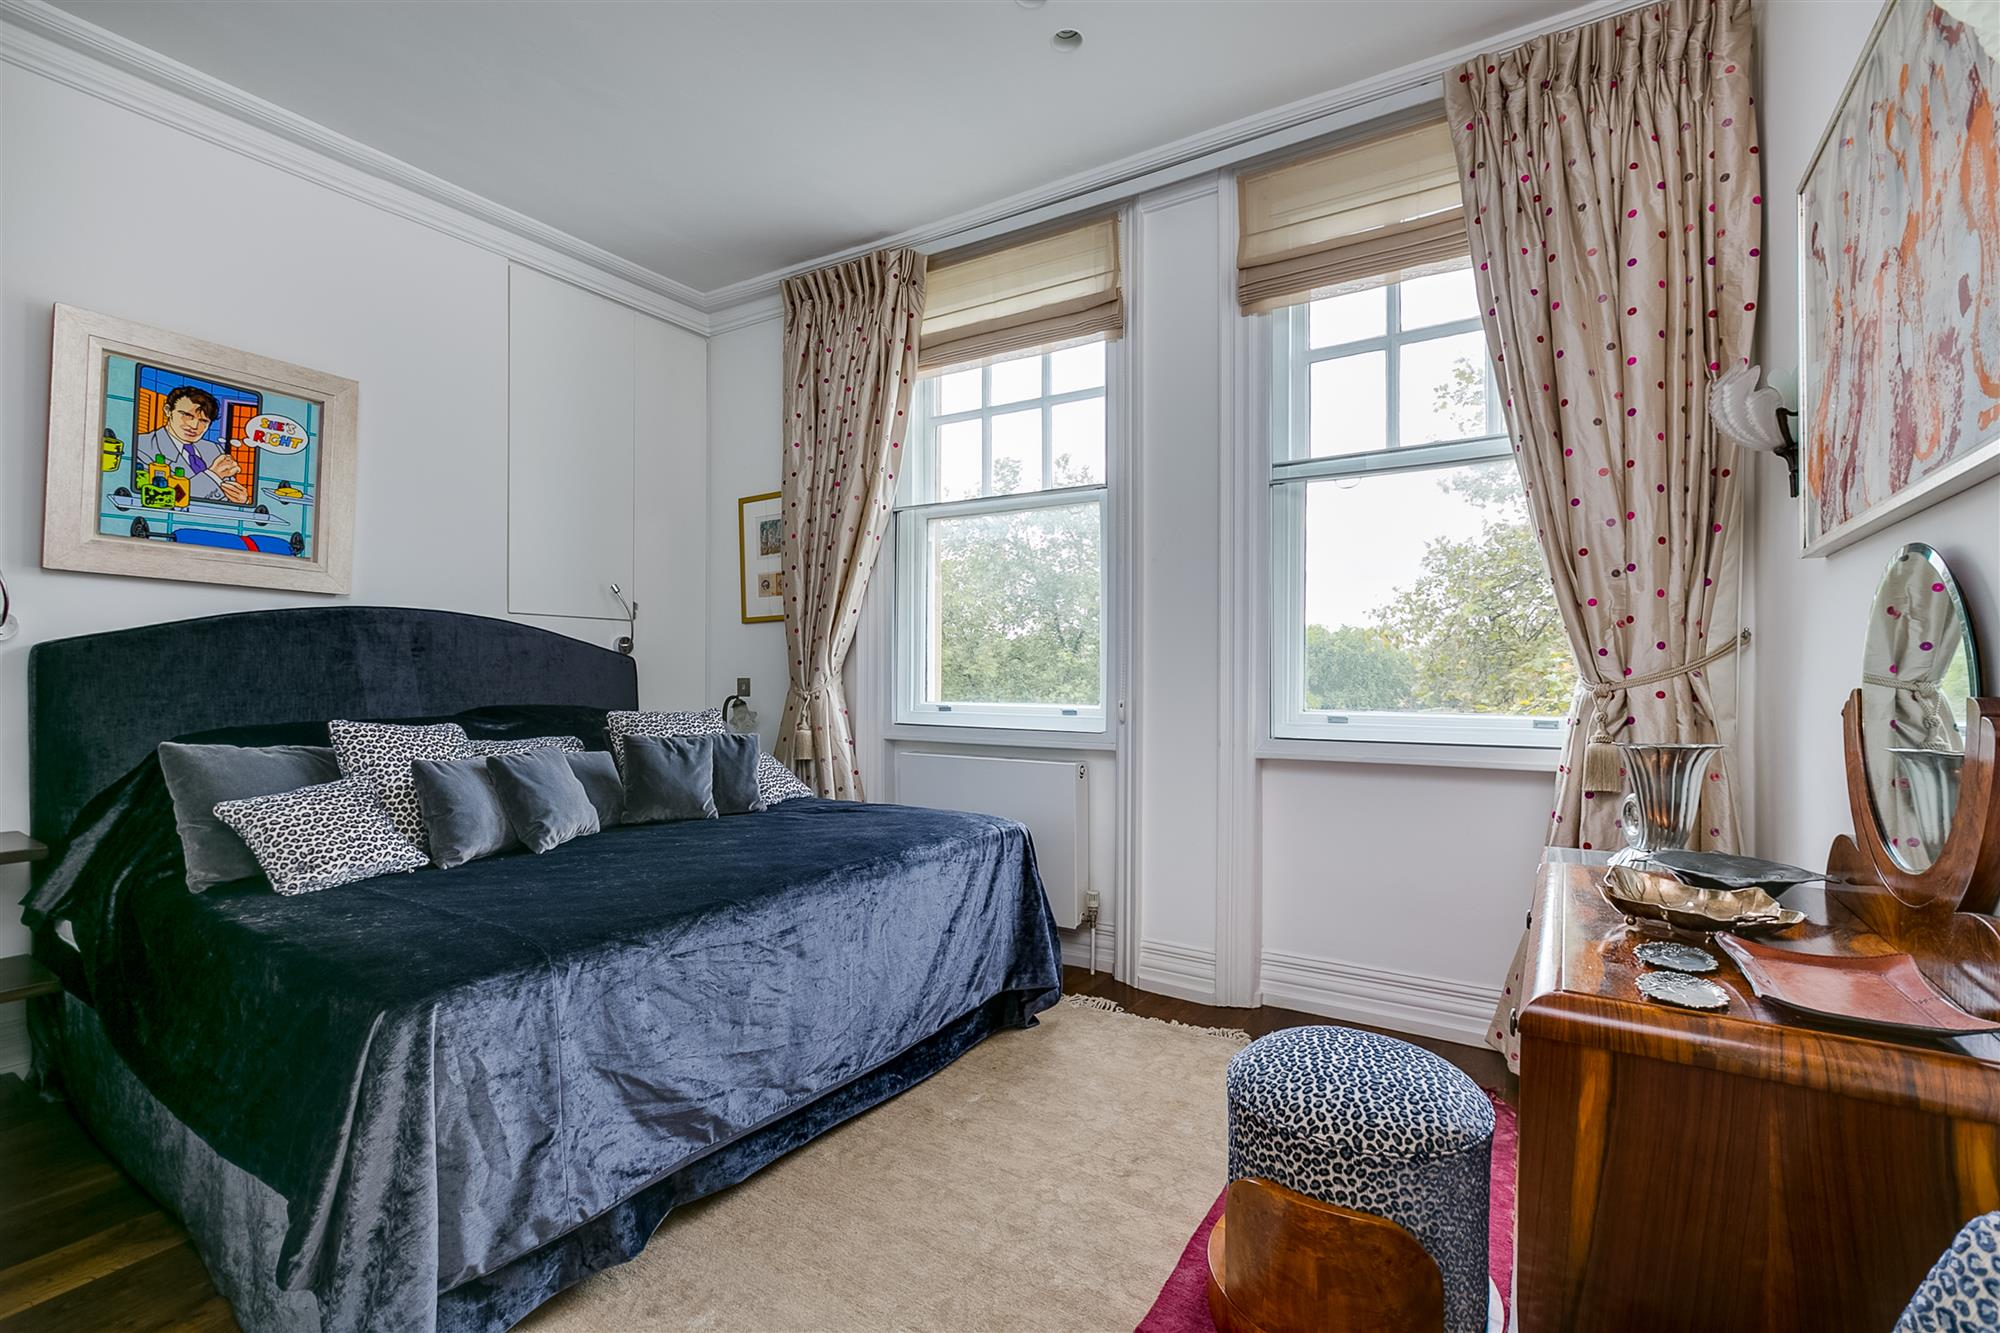 Properties for sale 2 bedroom apartment embankment gardens - 2 bedroom apartment for rent in chelsea ma ...